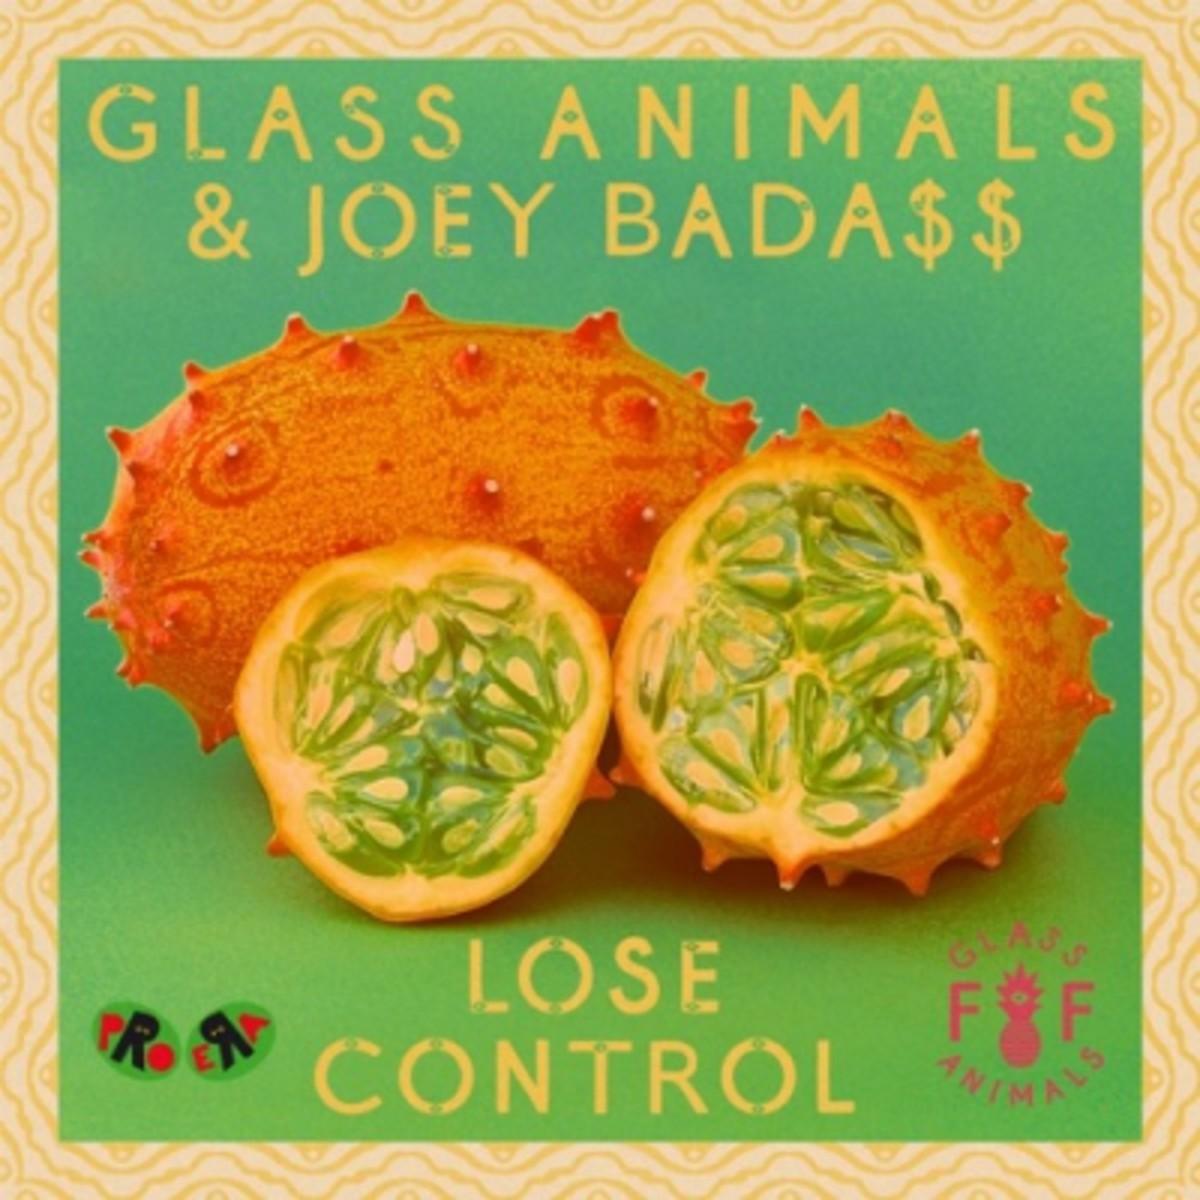 glass-animals-joey-badass-lose-control.jpg